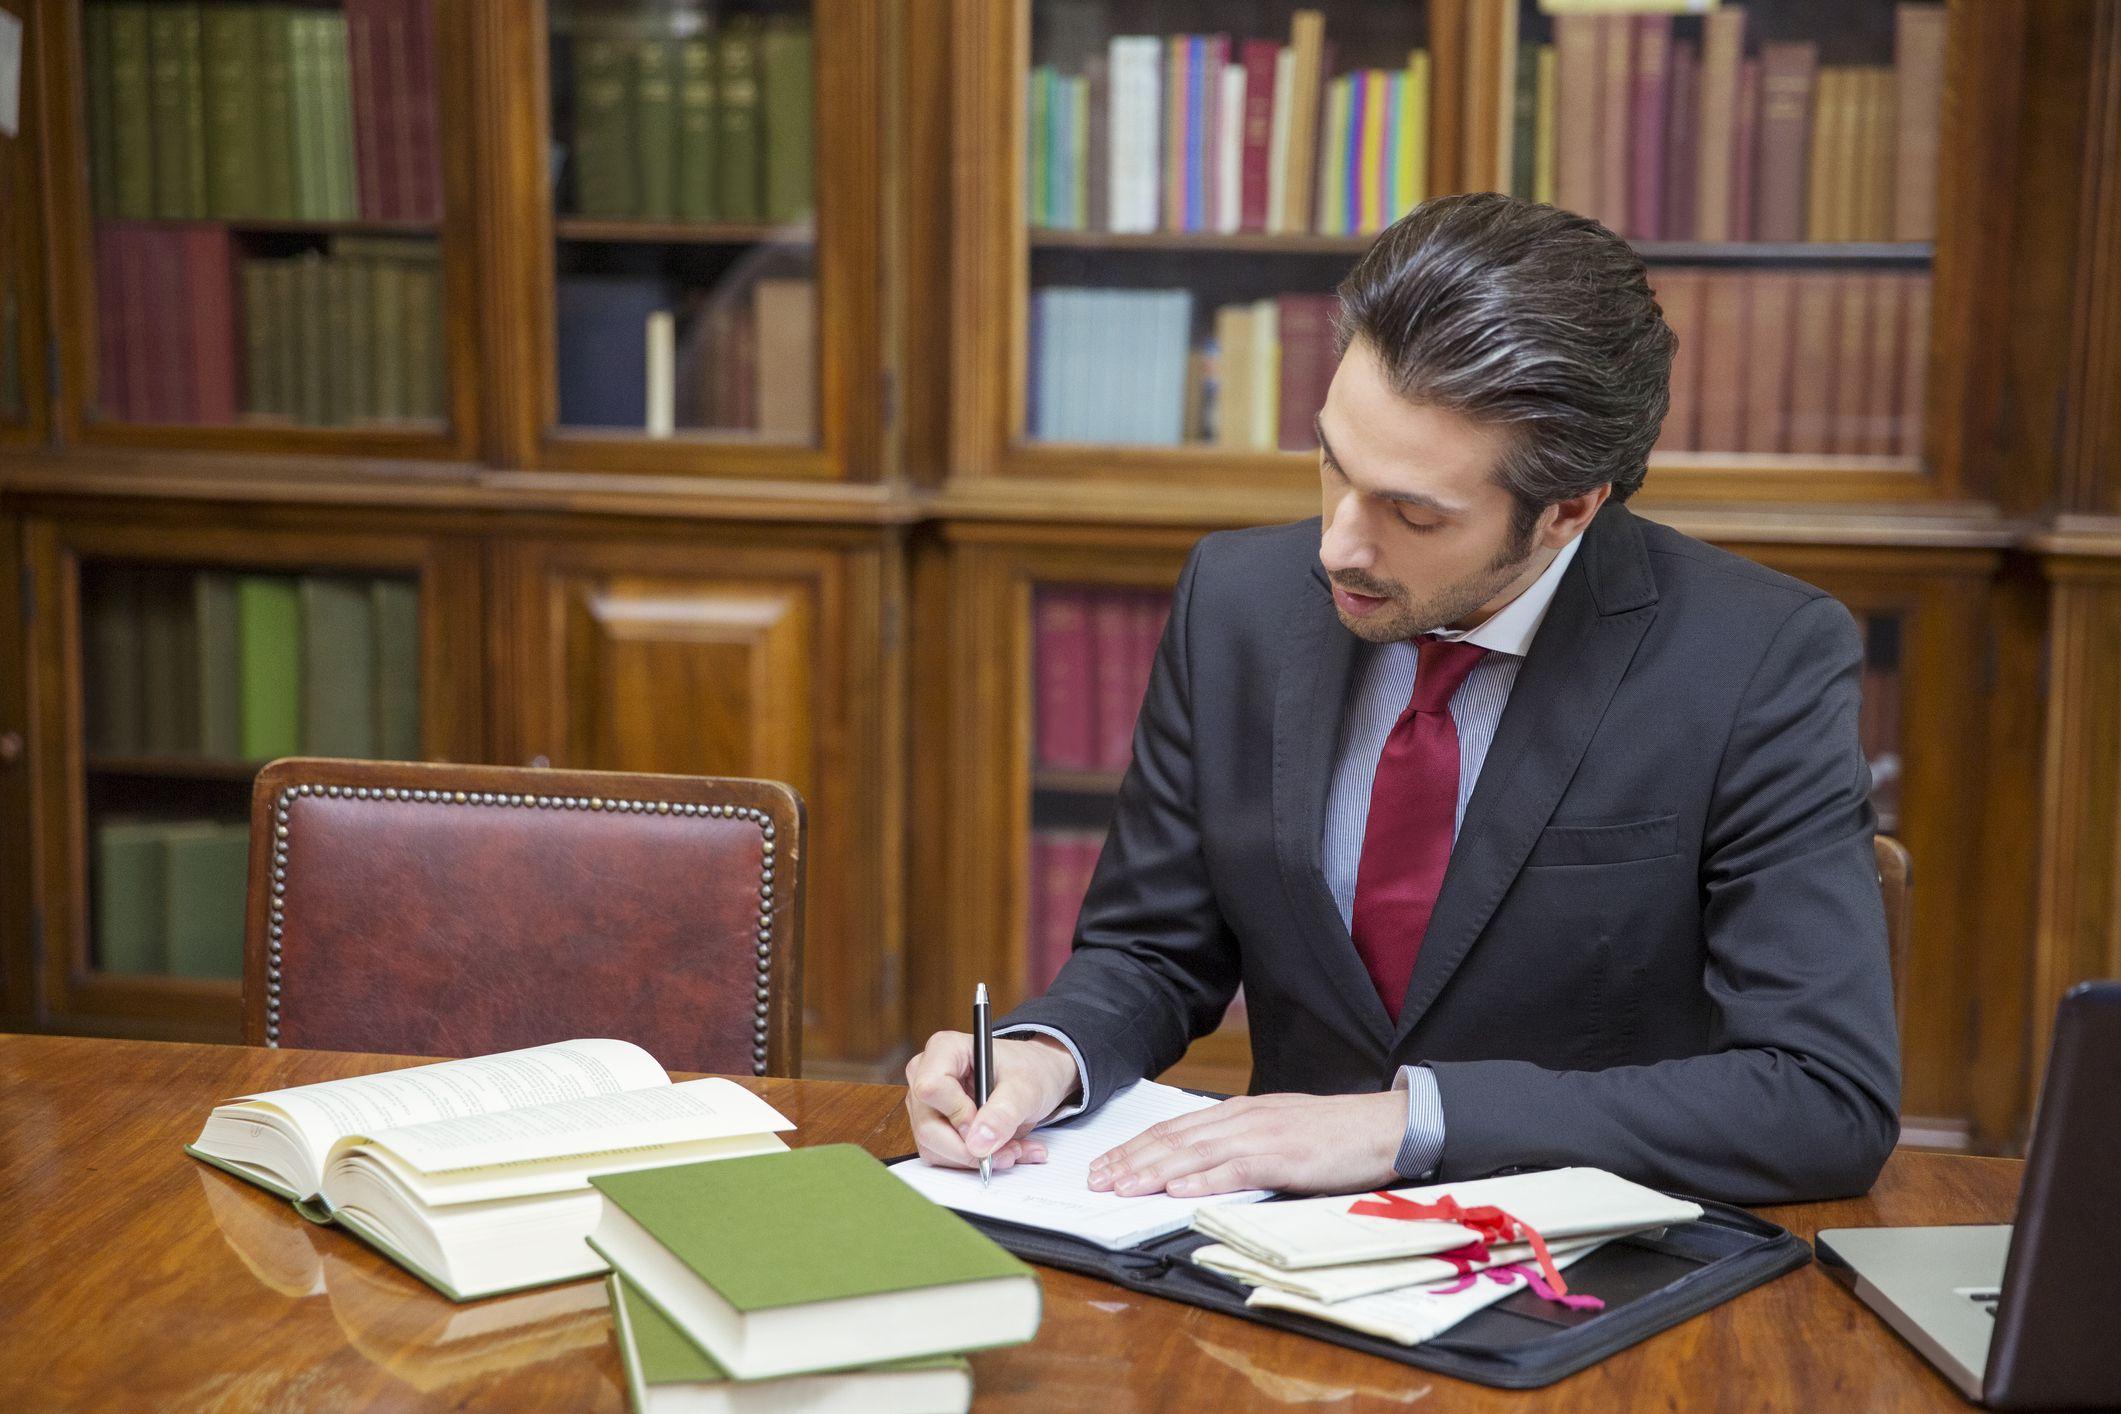 Professional Lawyer